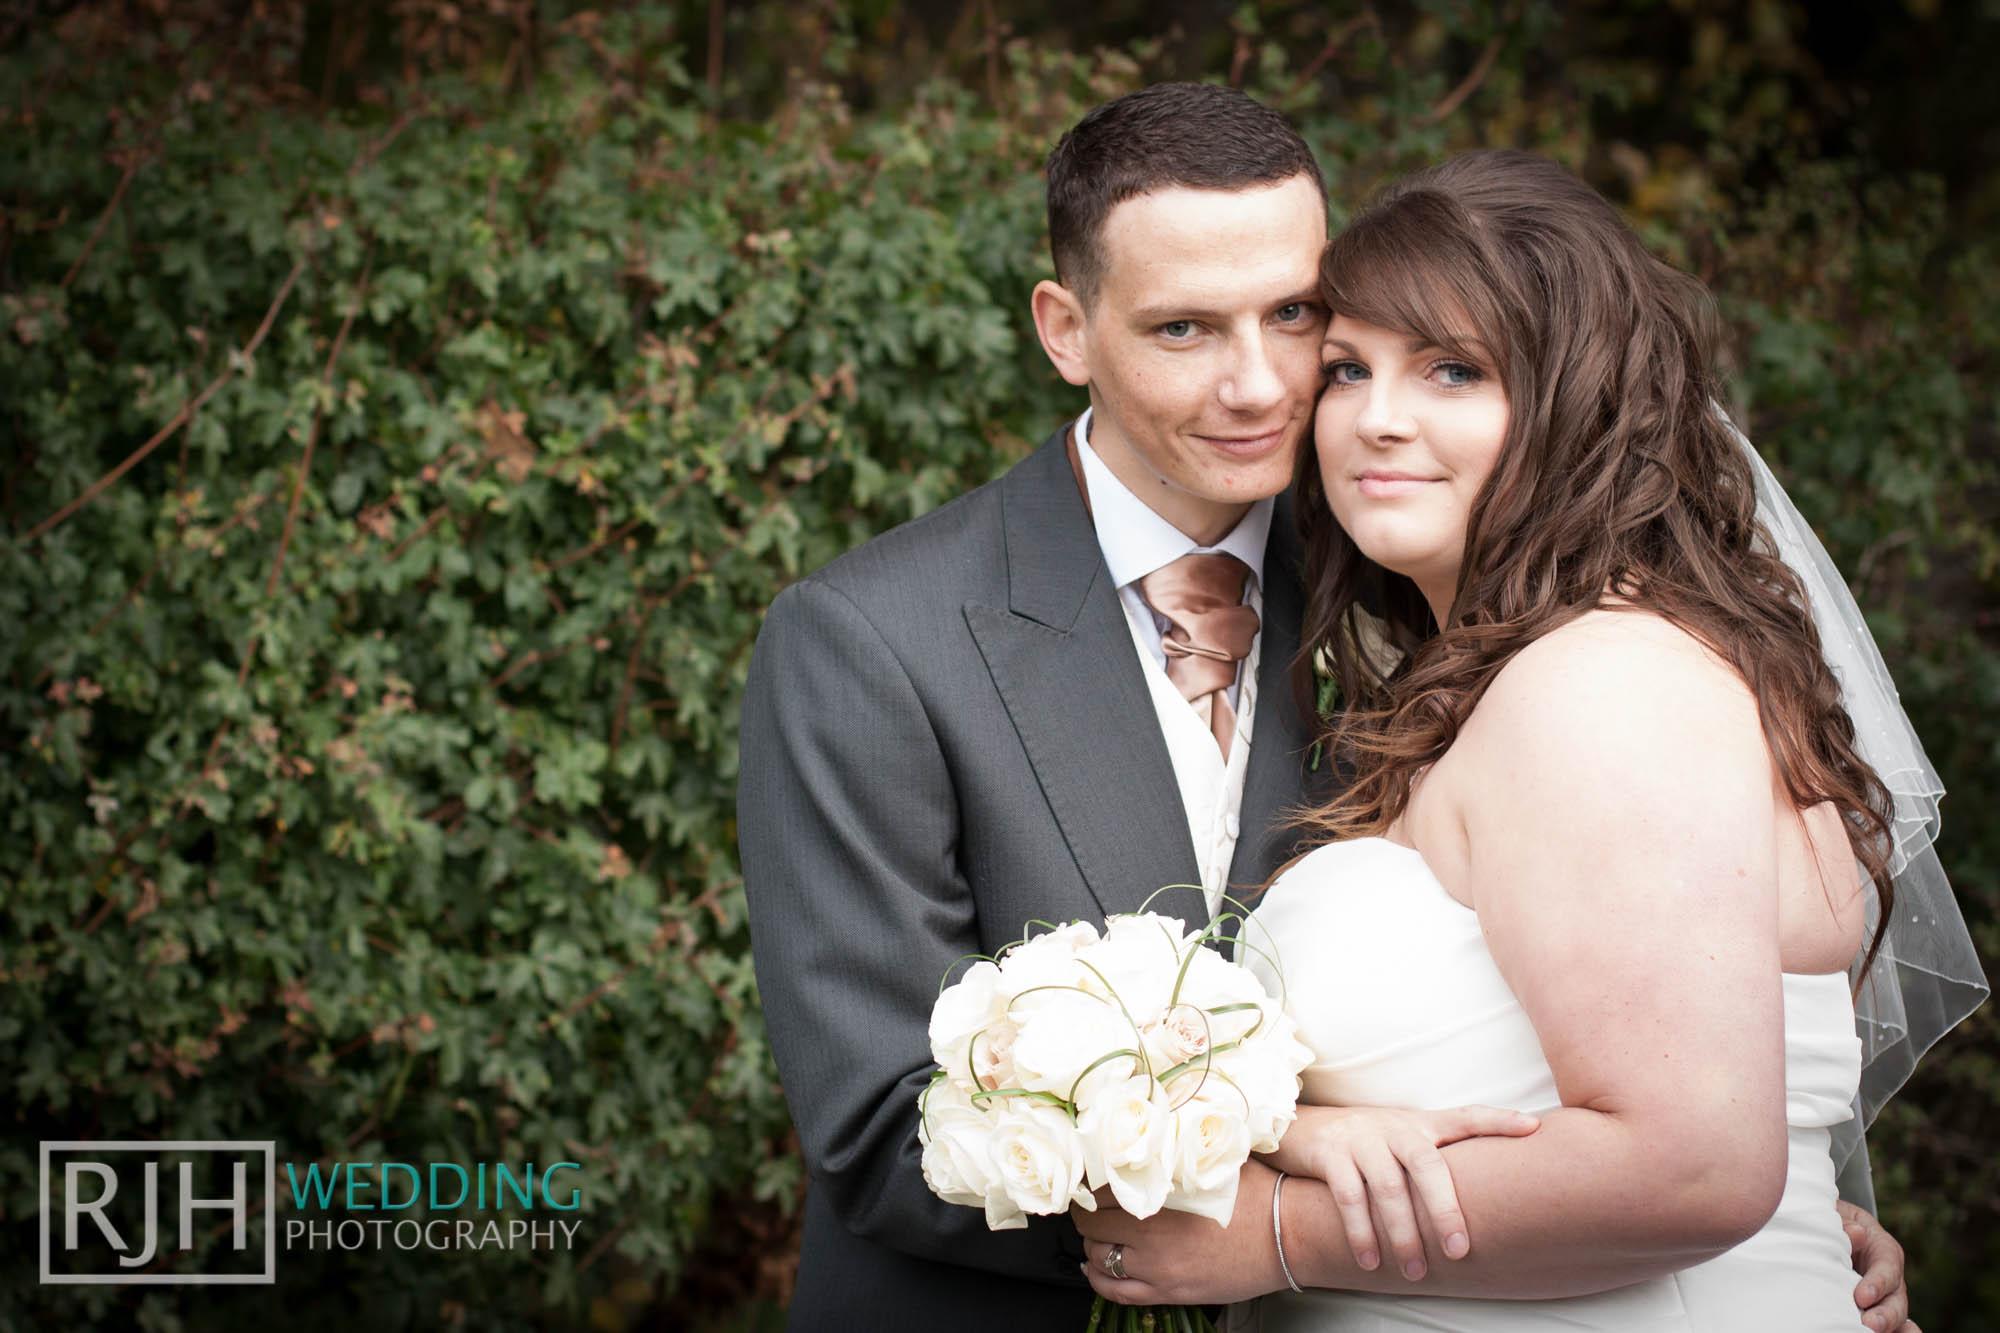 RJH Wedding Photography_2014 highlights_55.jpg